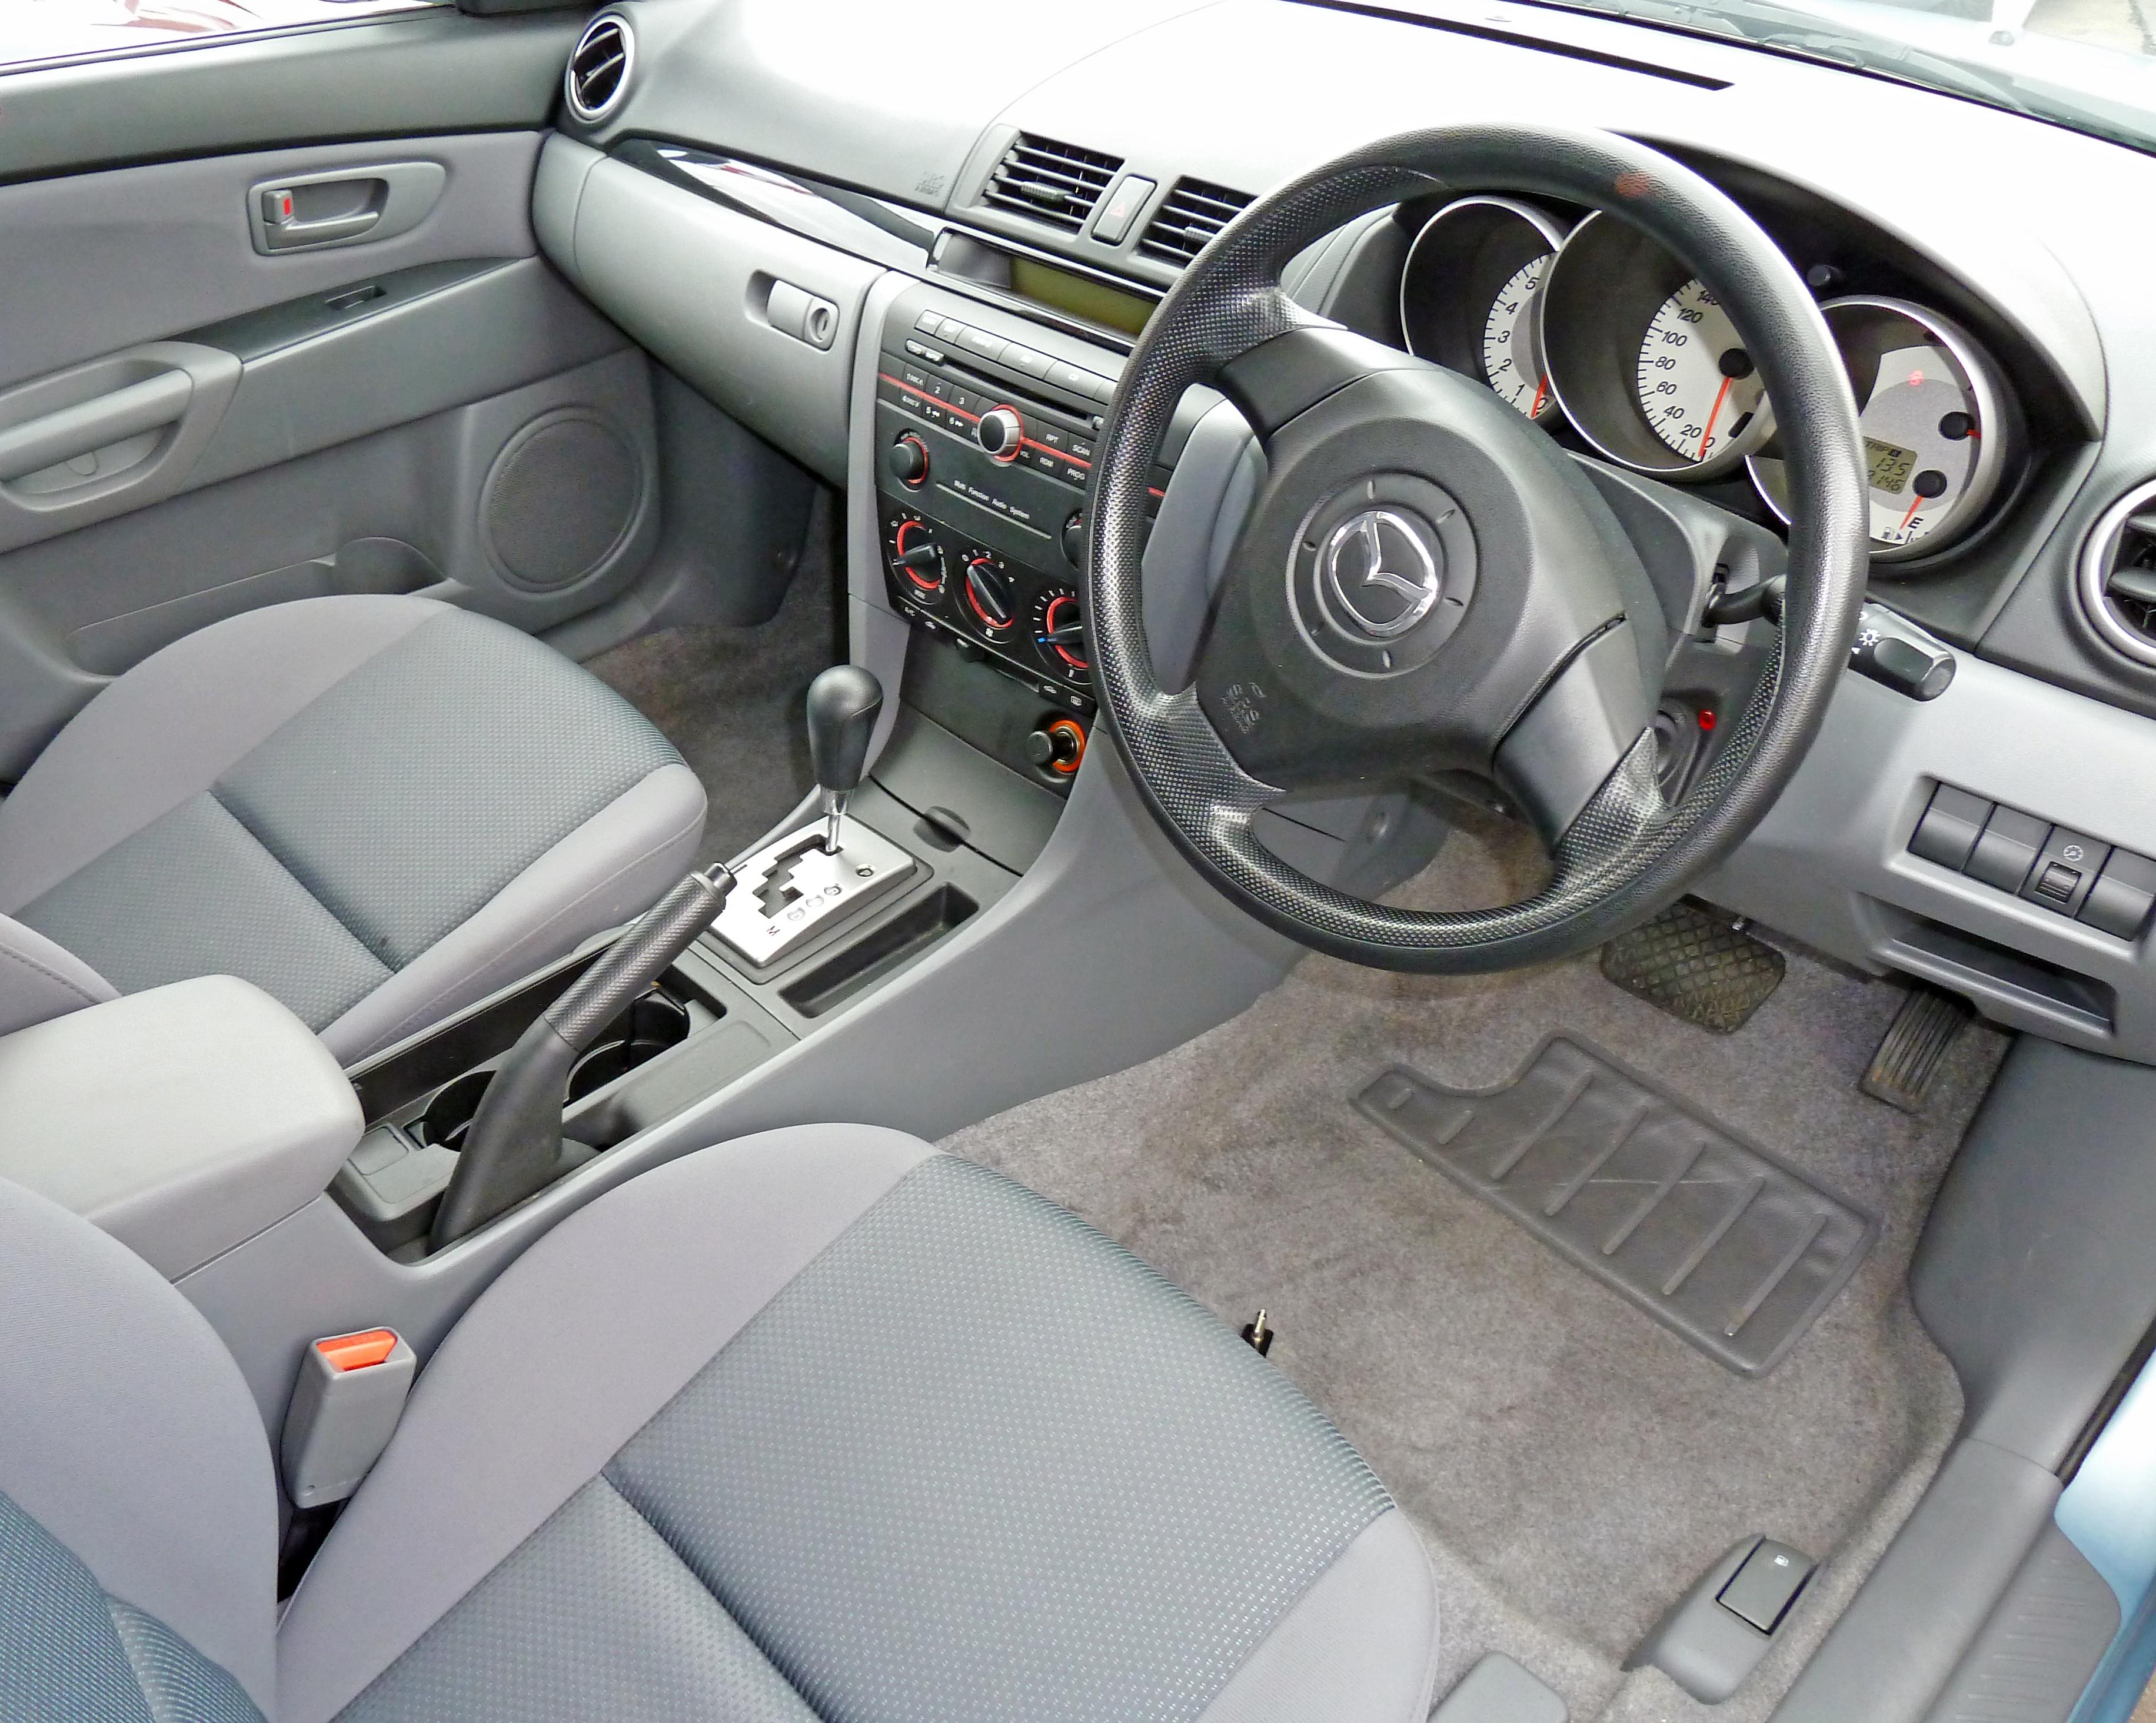 Mazda 3 I (BK) 2003 - 2006 Hatchback 5 door #3